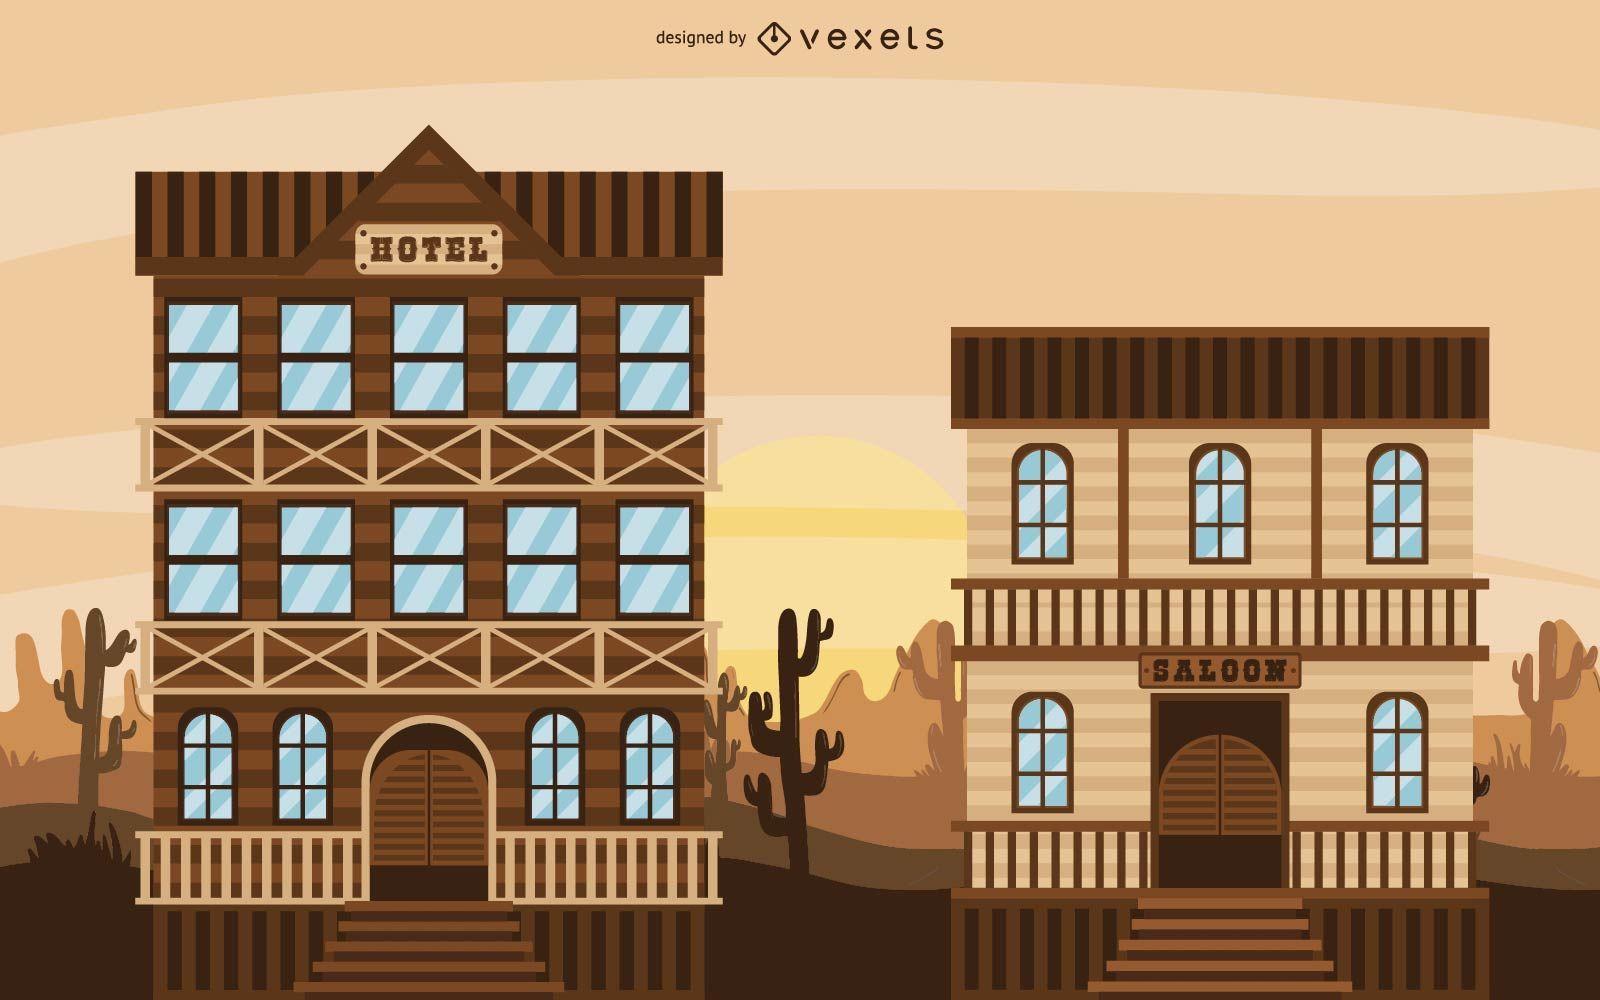 Cowboy Western Town Illustration